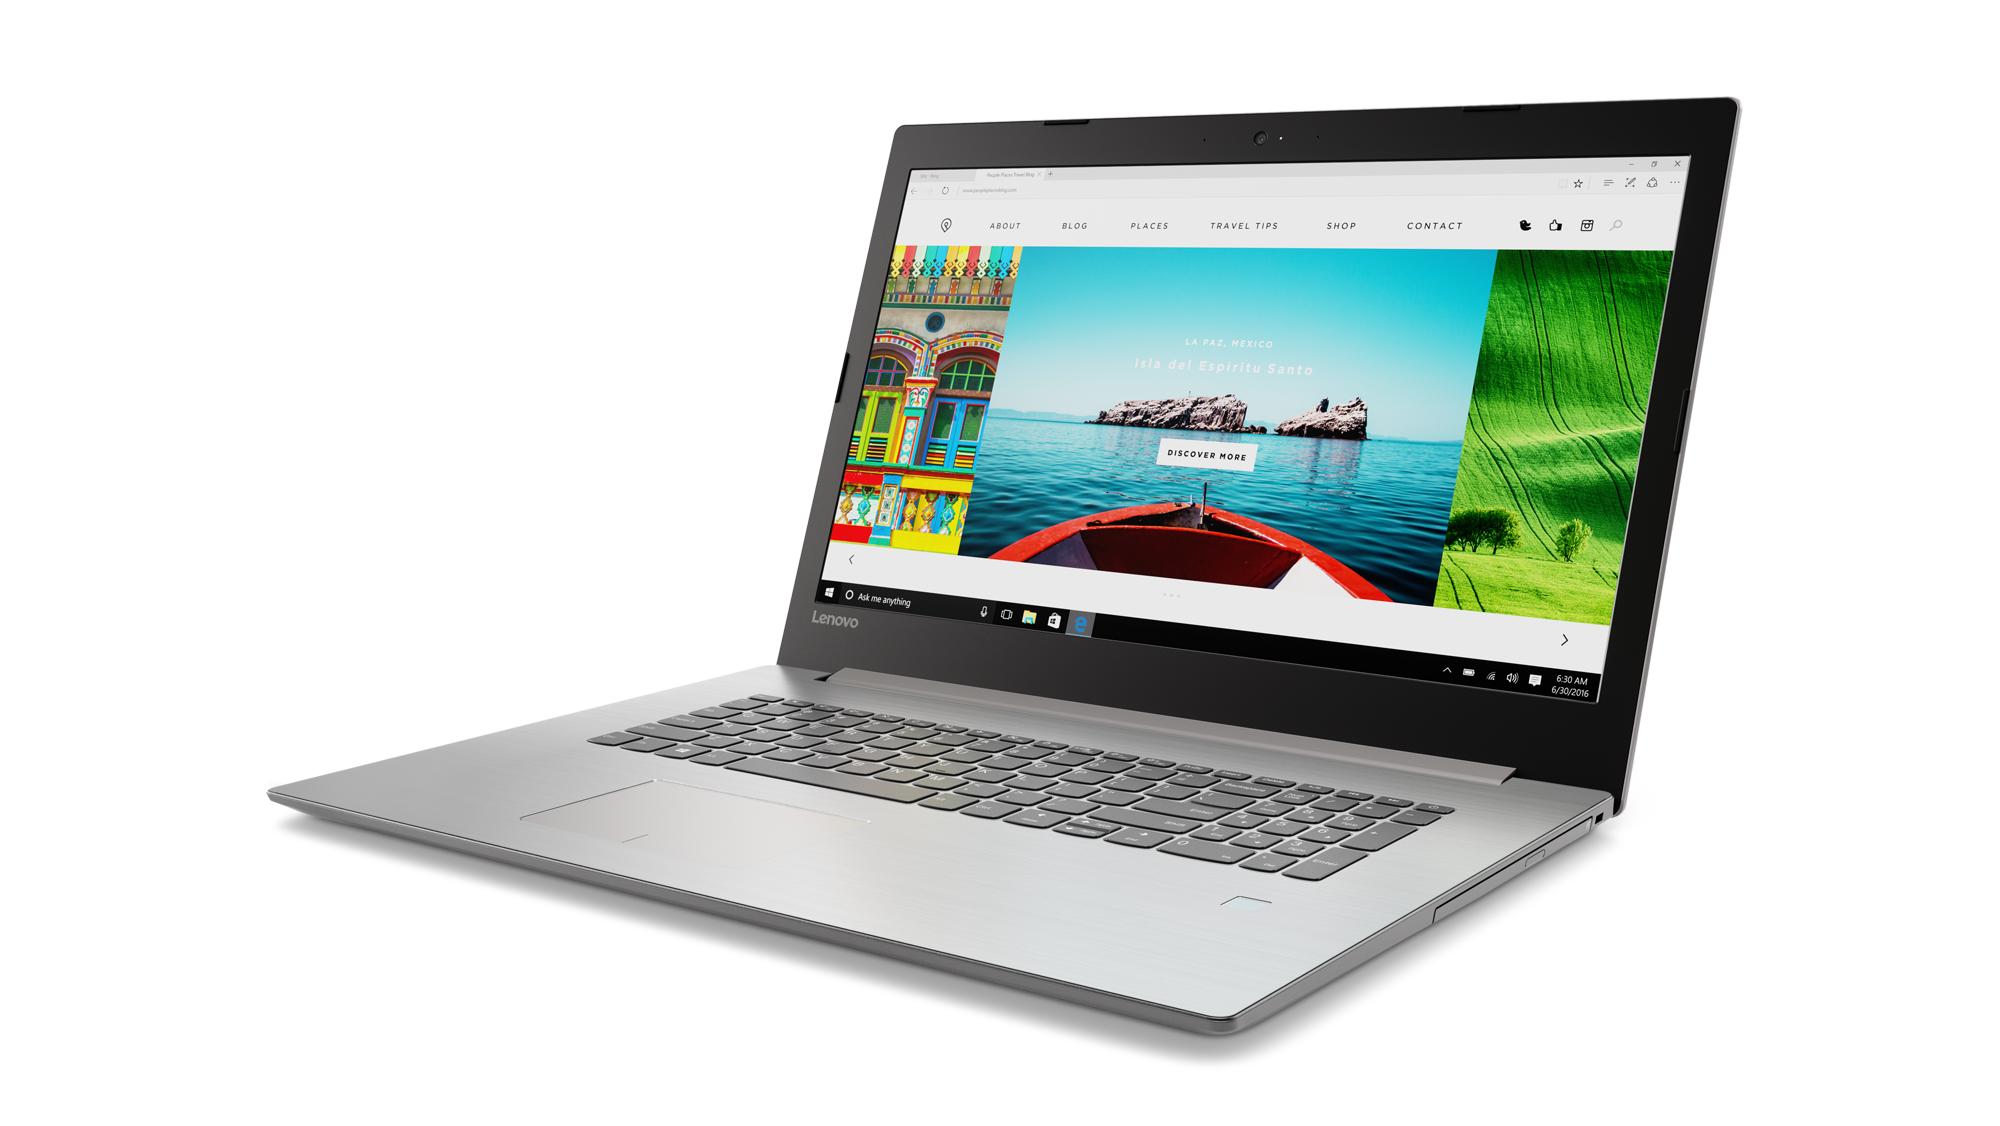 "Lenovo IdeaPad 320-17IKB i5-7200U 3,10GHz/8GB/SSD 128GB+HDD 1TB/17,3"" FHD/IPS/AG/GeForce 4GB/WIN10 šedá 80XM001RCK"